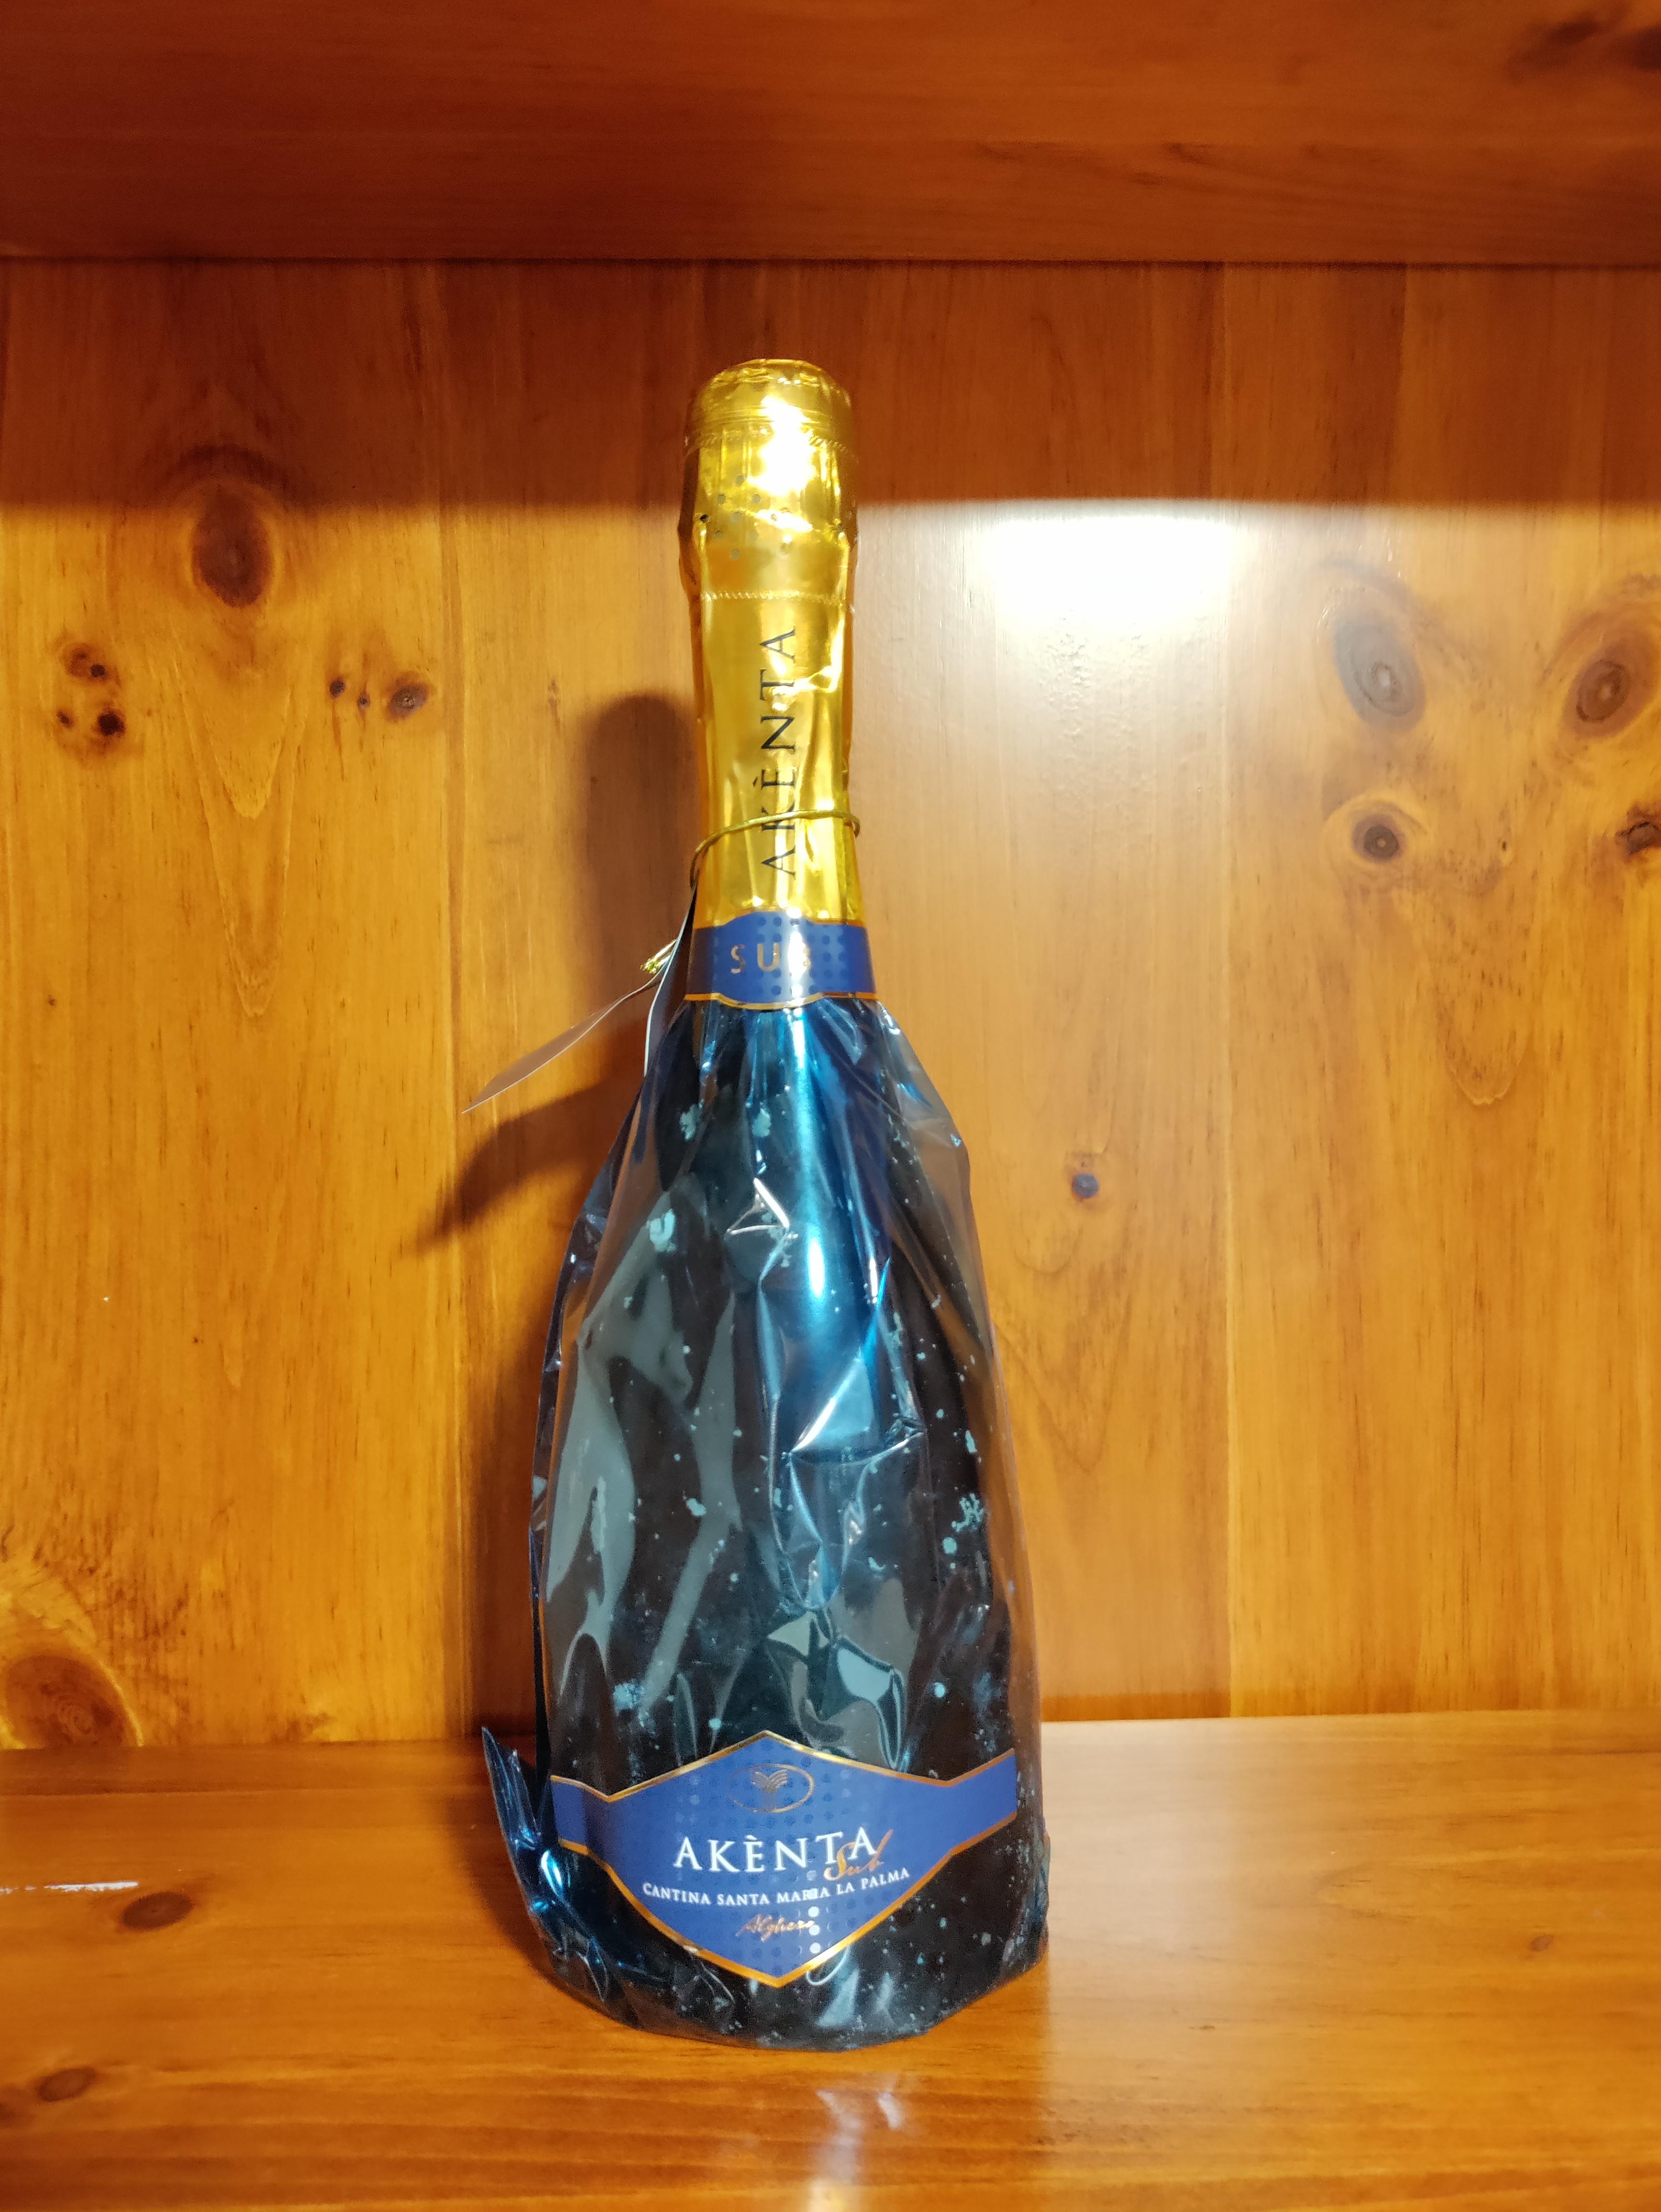 Akenta Sub Vermentino di Sardegna Doc Vino Spumante Extra Dry cl.75 - SMlaPALMA